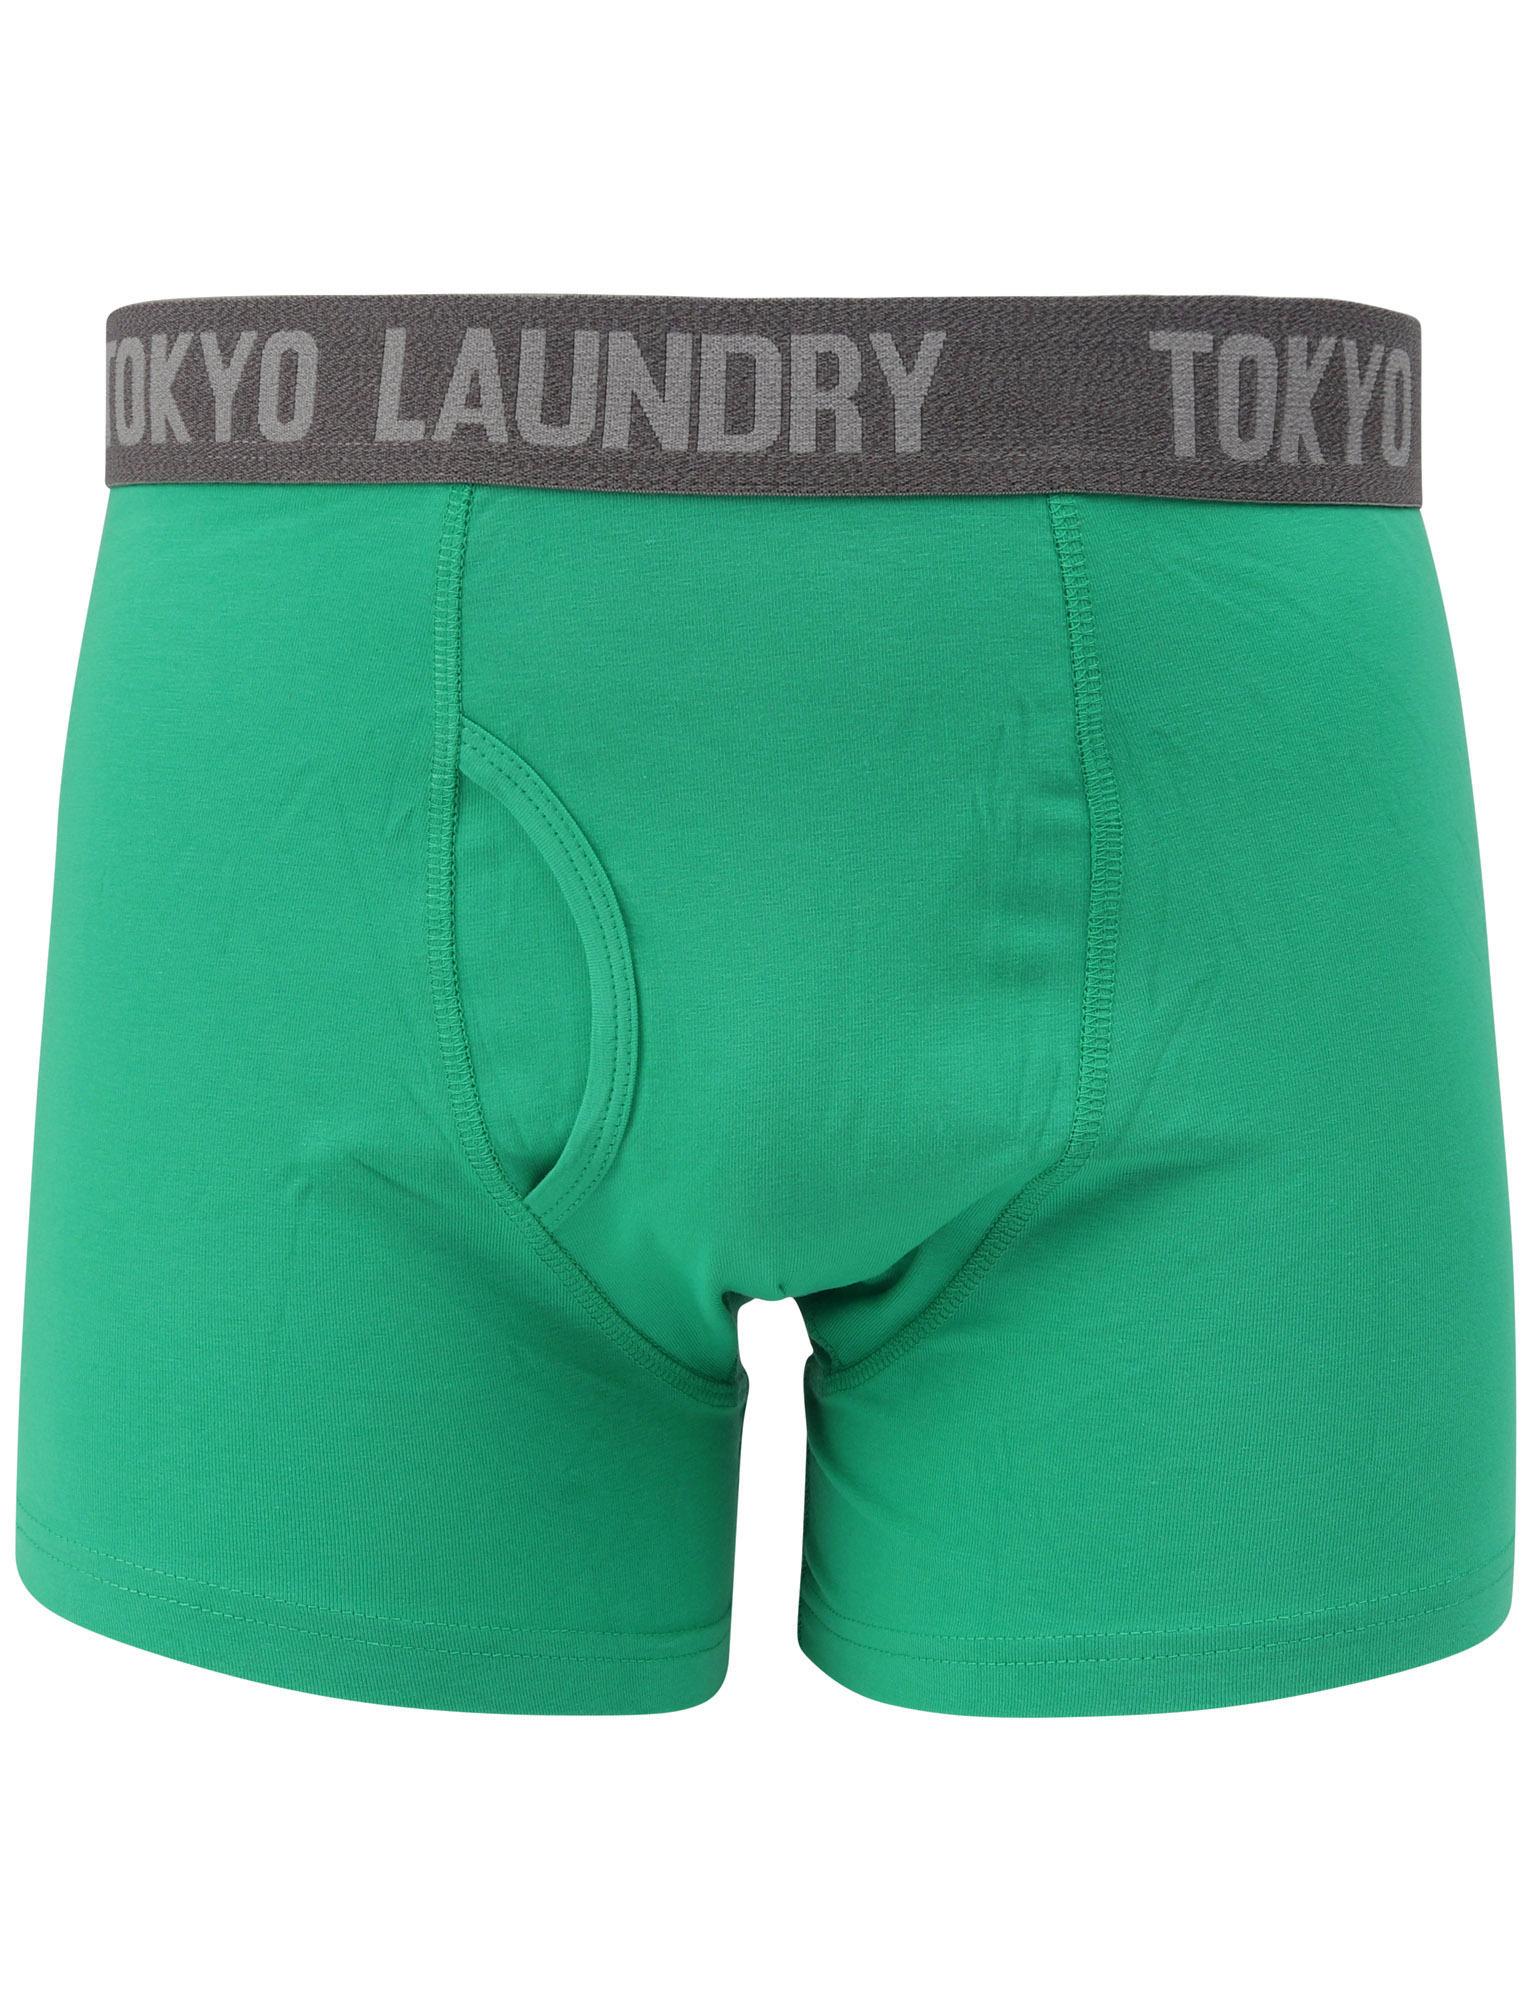 New-Mens-Tokyo-Laundry-2-Pack-Cotton-Rich-Boxer-Shorts-Set-Trunks-Size-S-XXL thumbnail 45